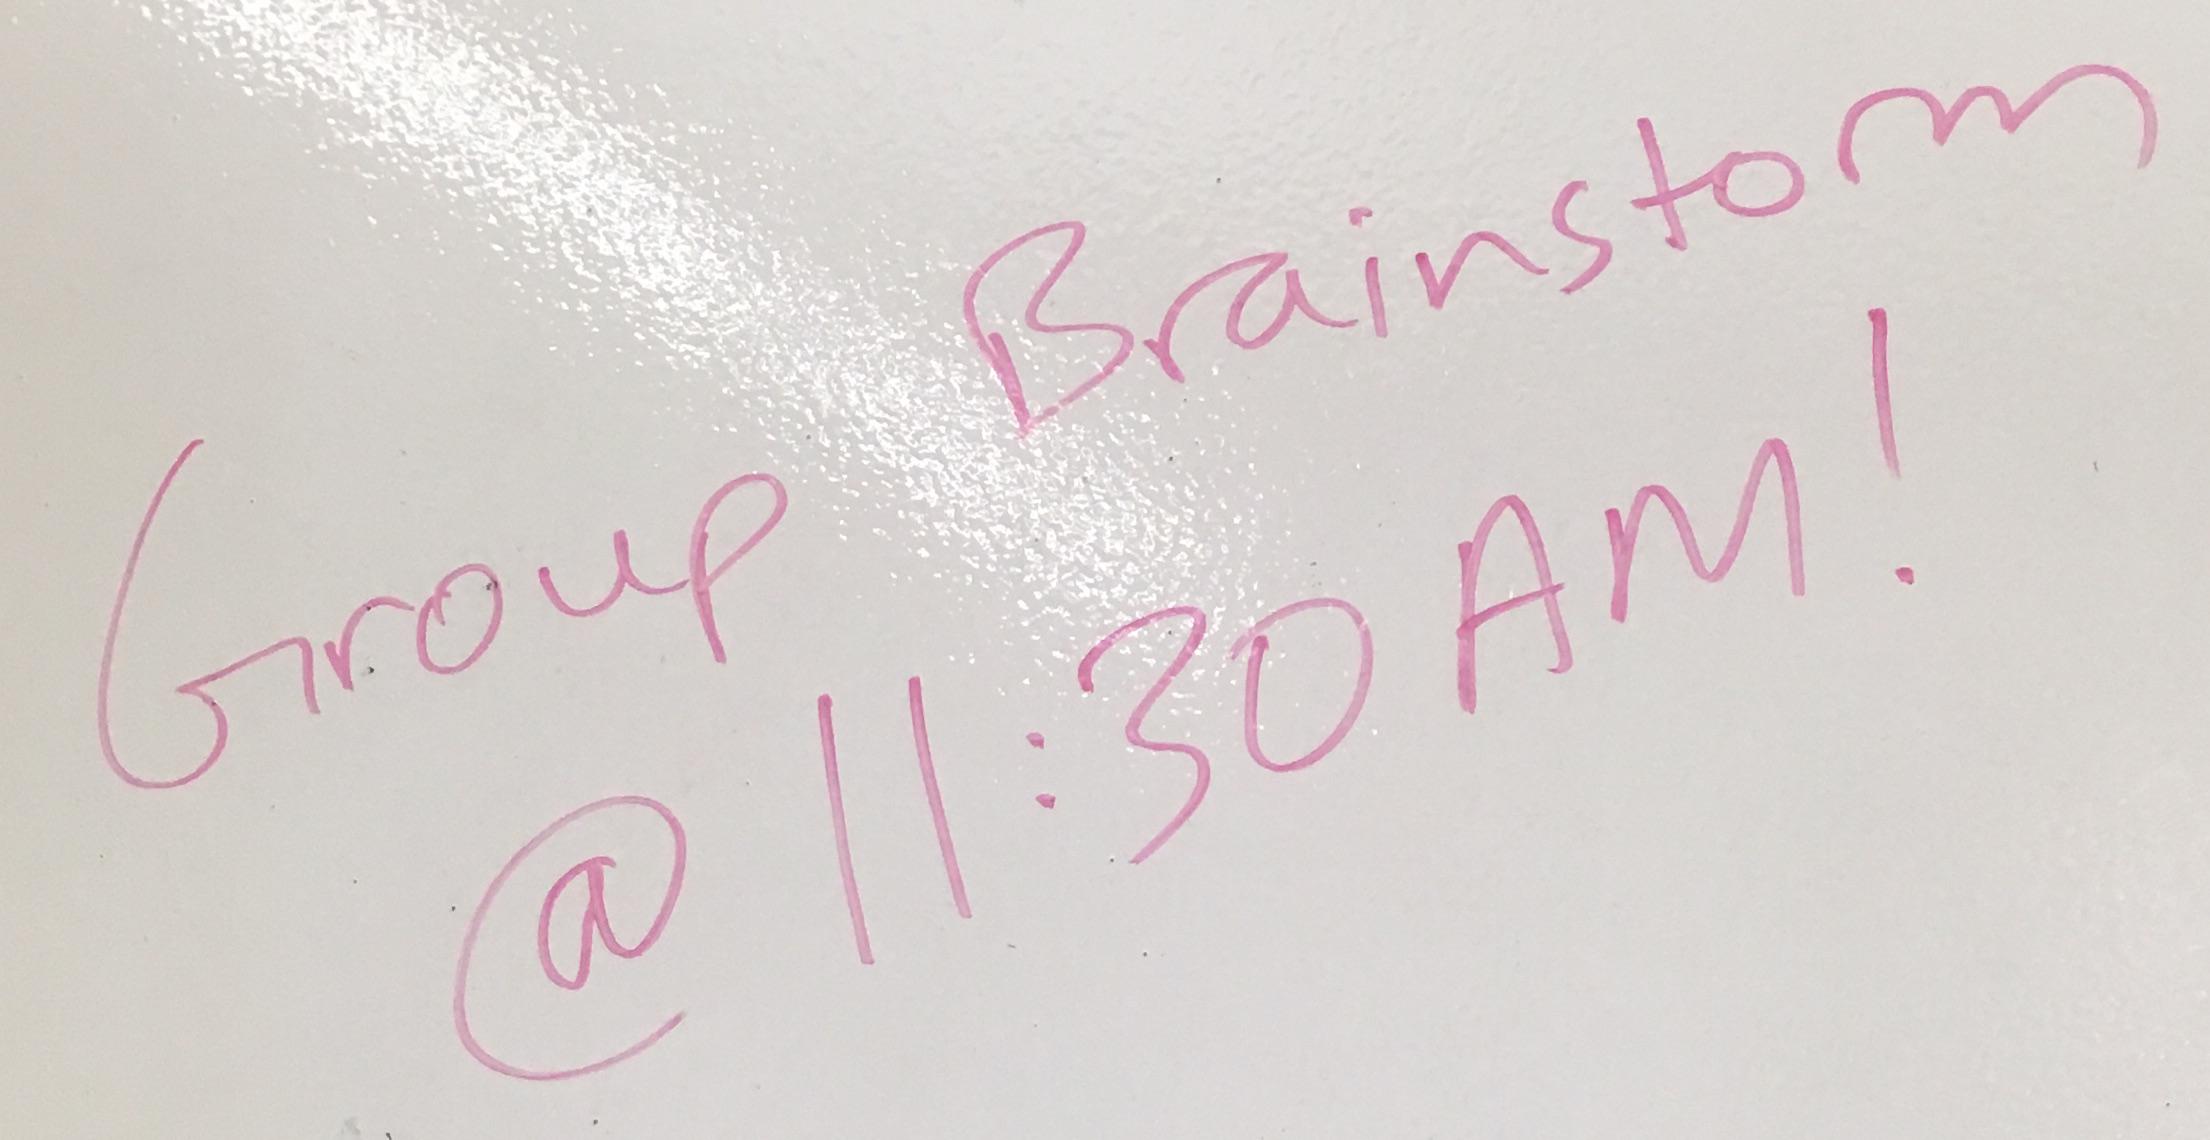 group brainstorm at 11:30AM